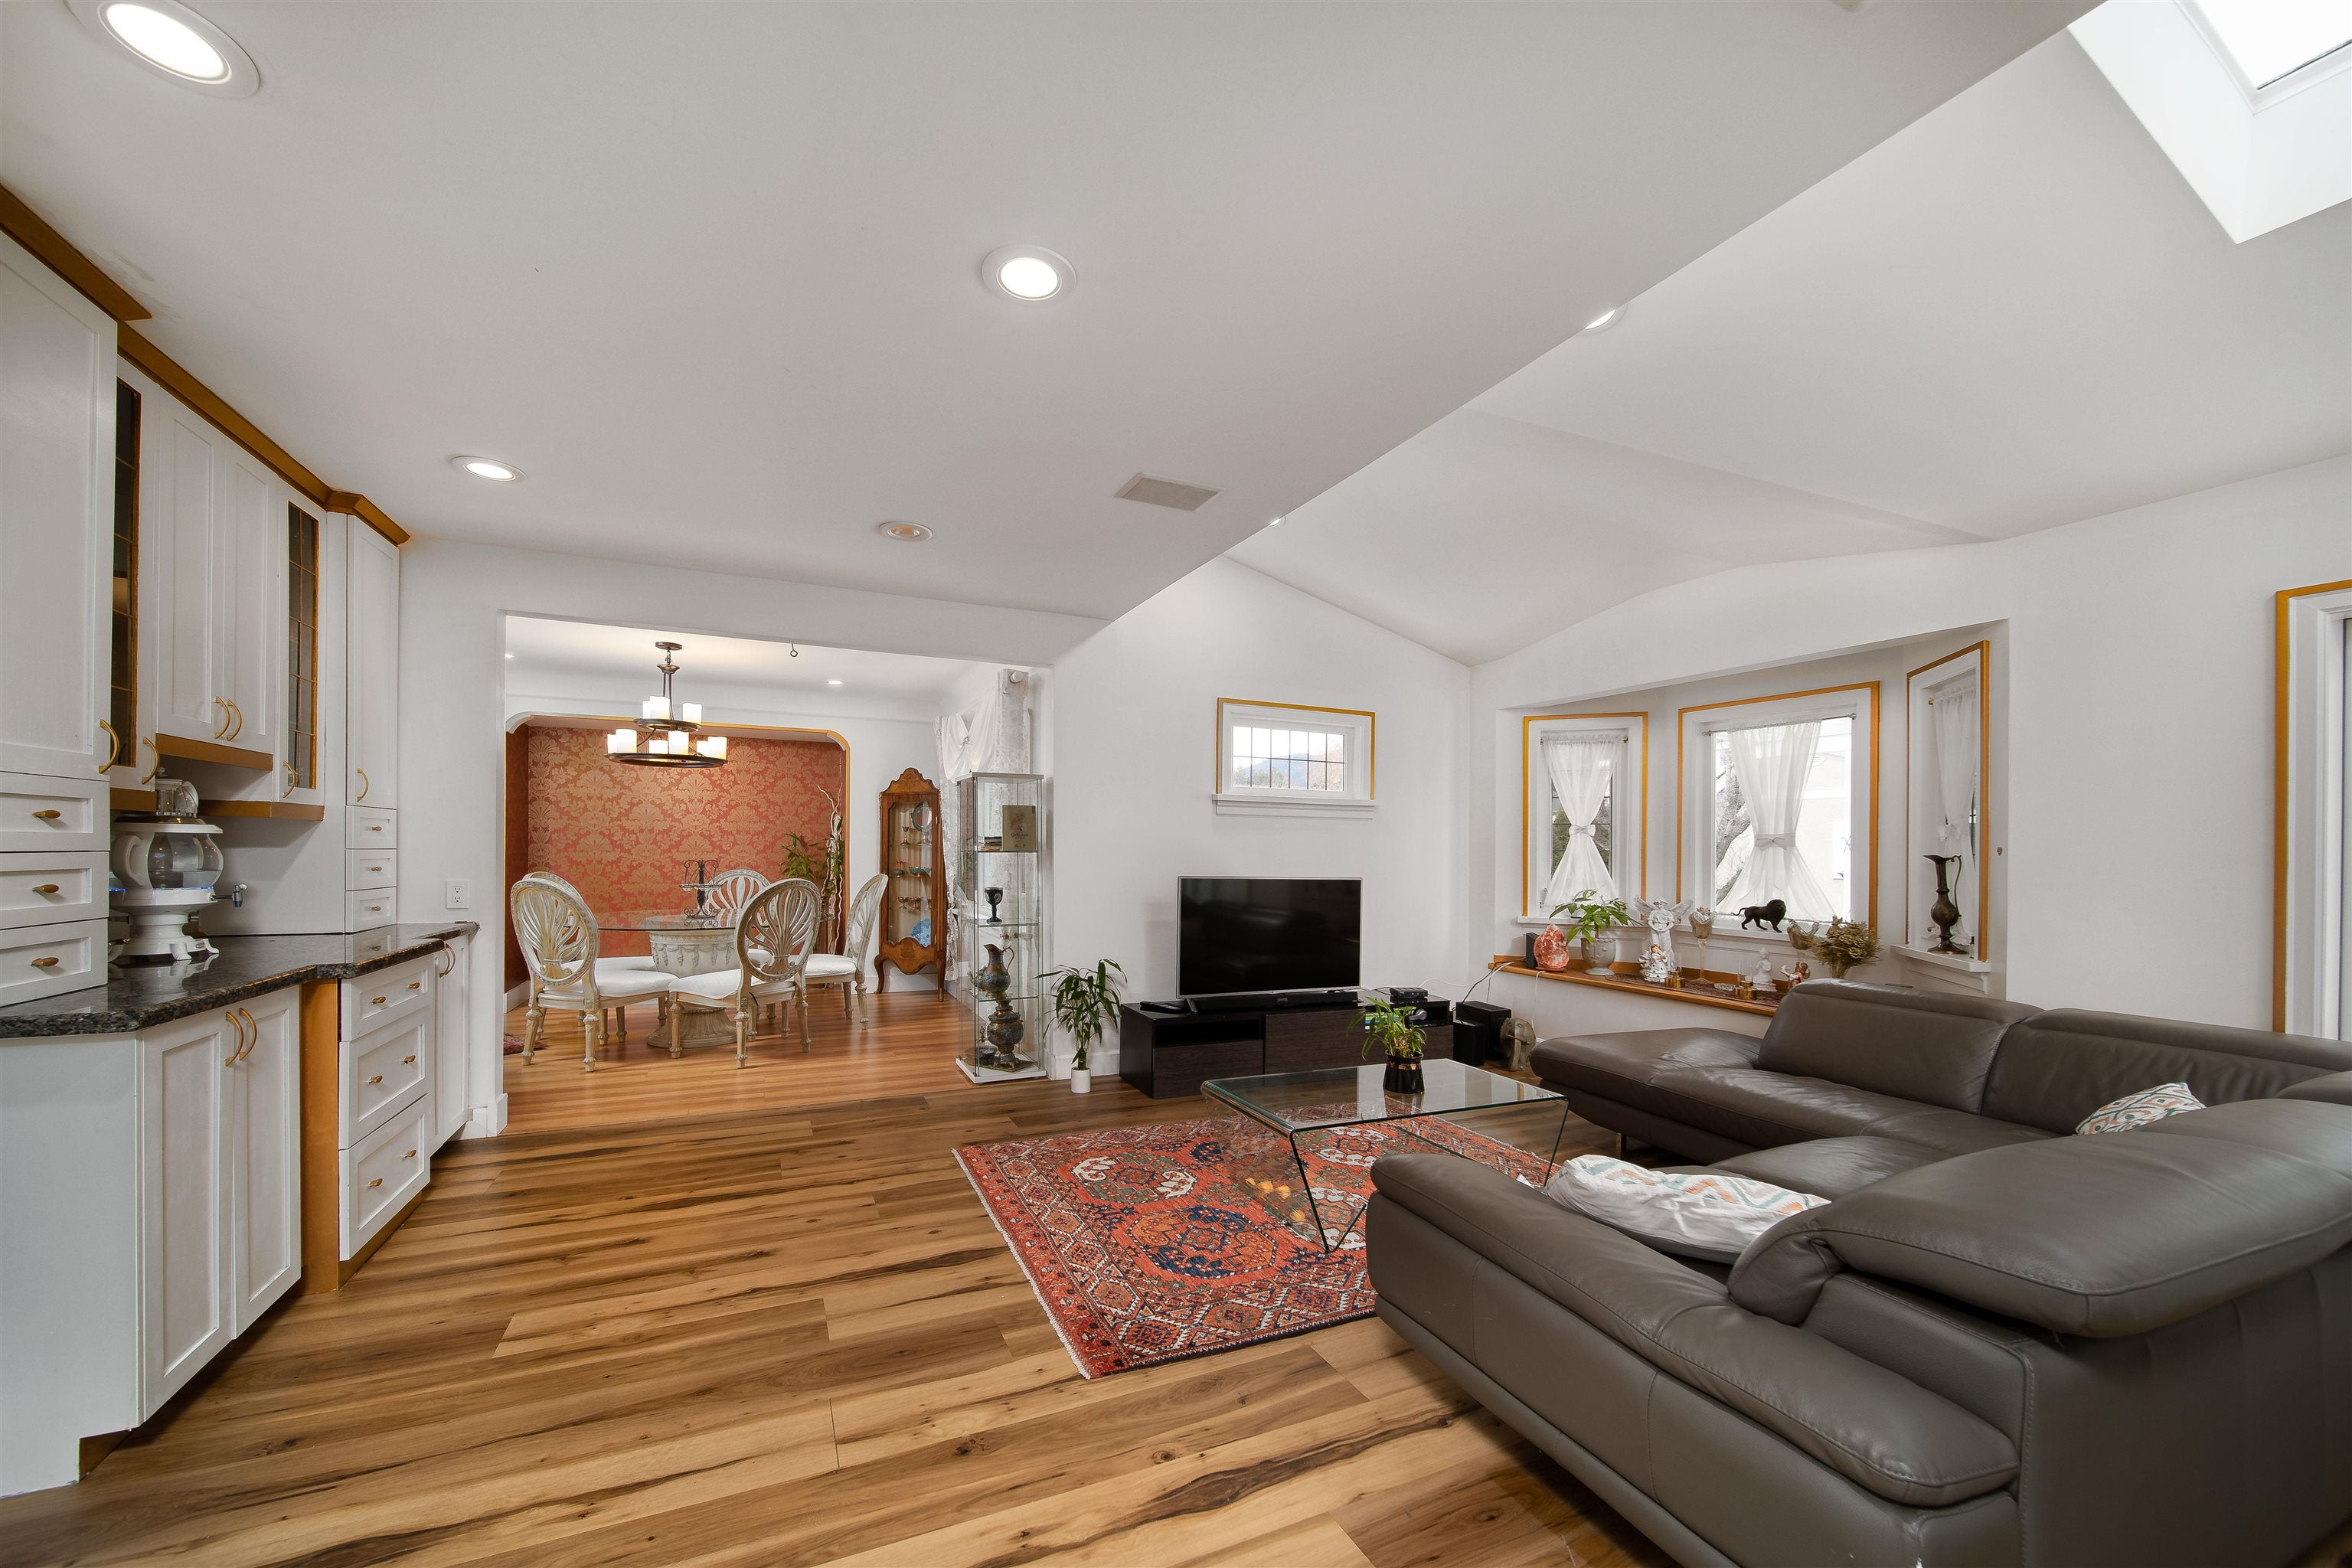 1357 FULTON AVENUE - Ambleside House/Single Family for sale, 6 Bedrooms (R2617731) - #13